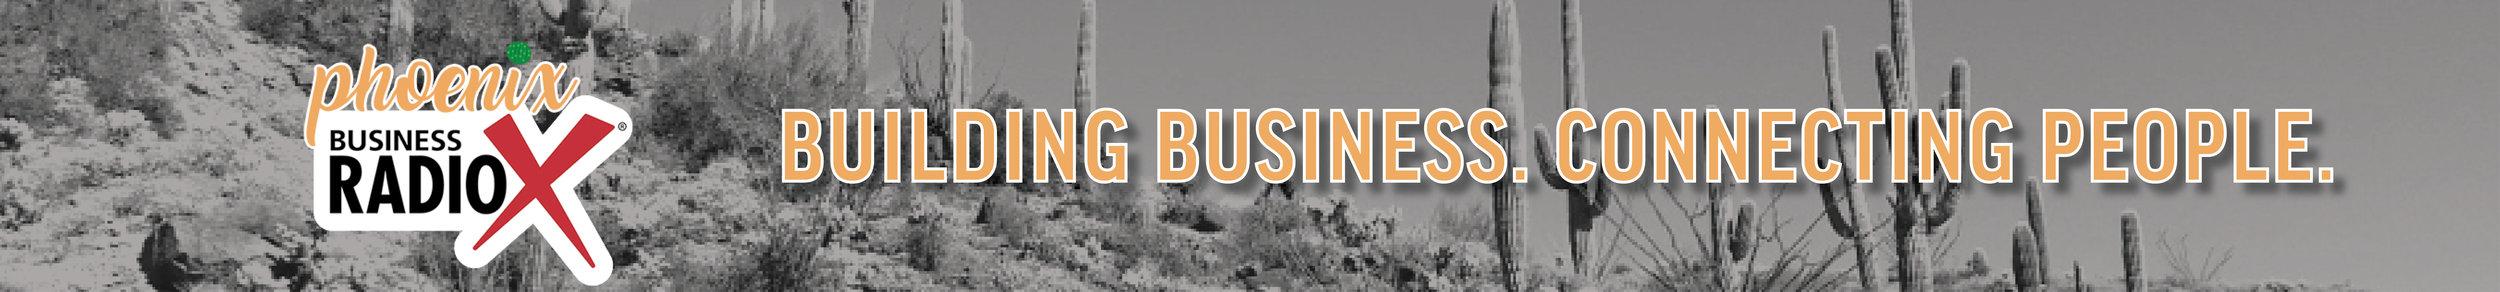 Phoenix Business Radio X